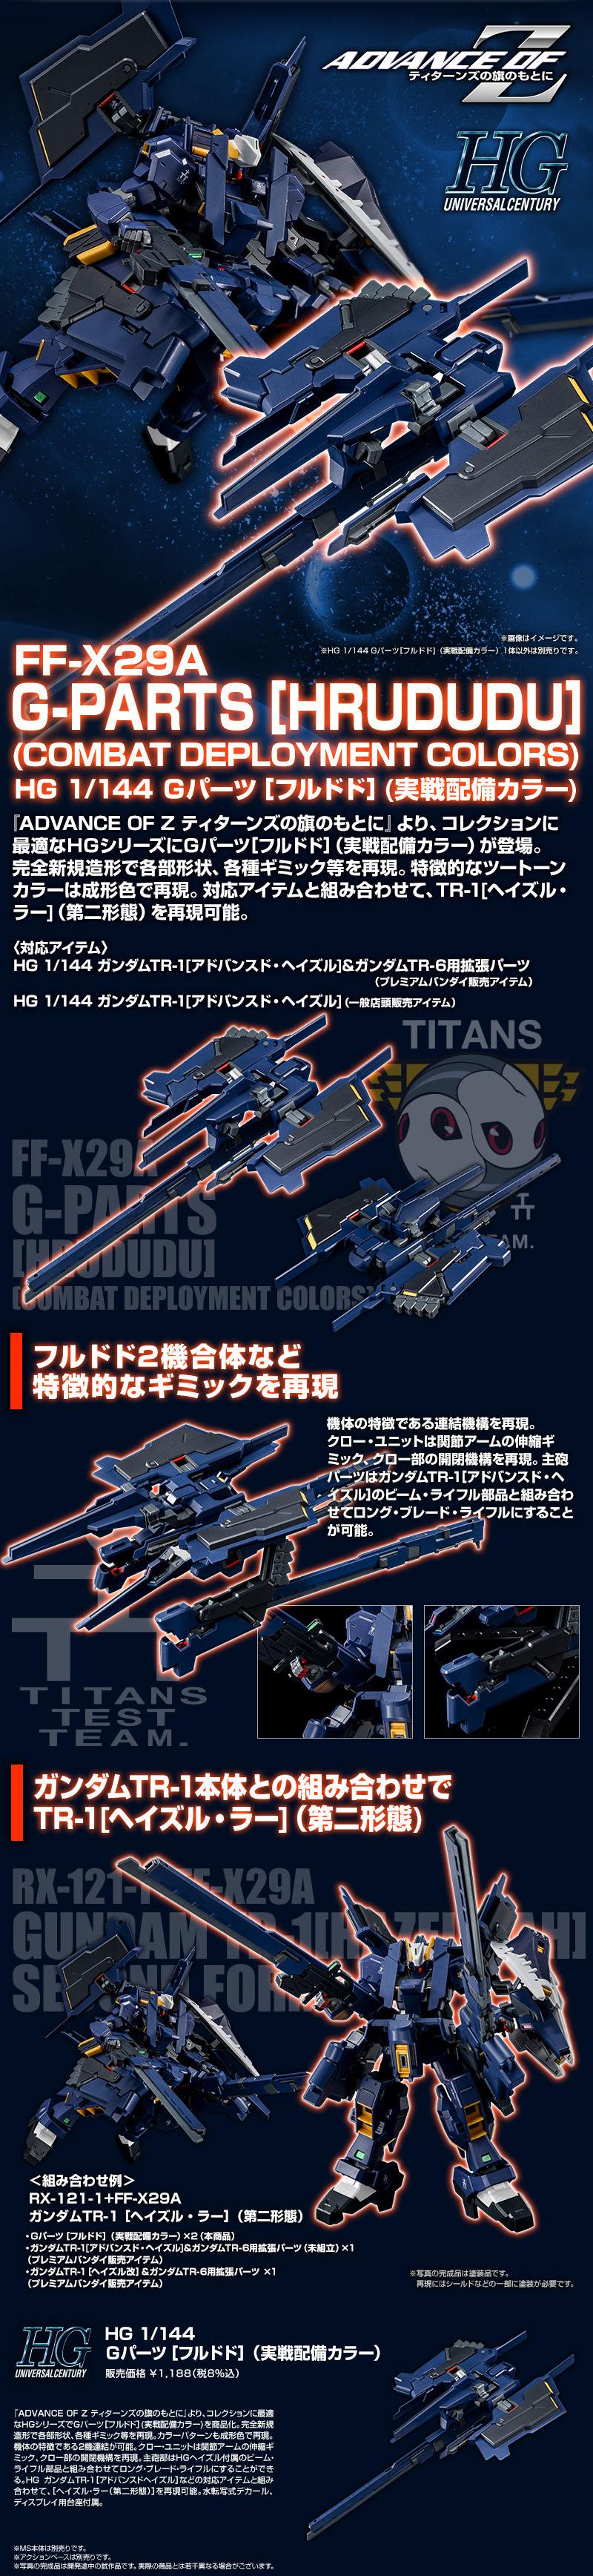 "HGUC 1/144 FF-X29A Gパーツ[フルドド](実戦配備カラー) [G-Parts ""Hrududu"" (Combat Deployment type)] 公式商品説明(画像)"